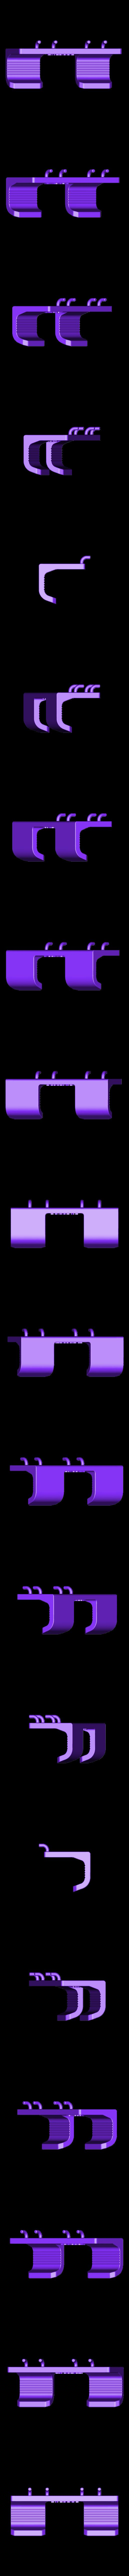 enforce_100_pins.stl Download free STL file Engineers Hammer Holder 100g 027 I for screws or peg board • 3D printer model, Wiesemann1893